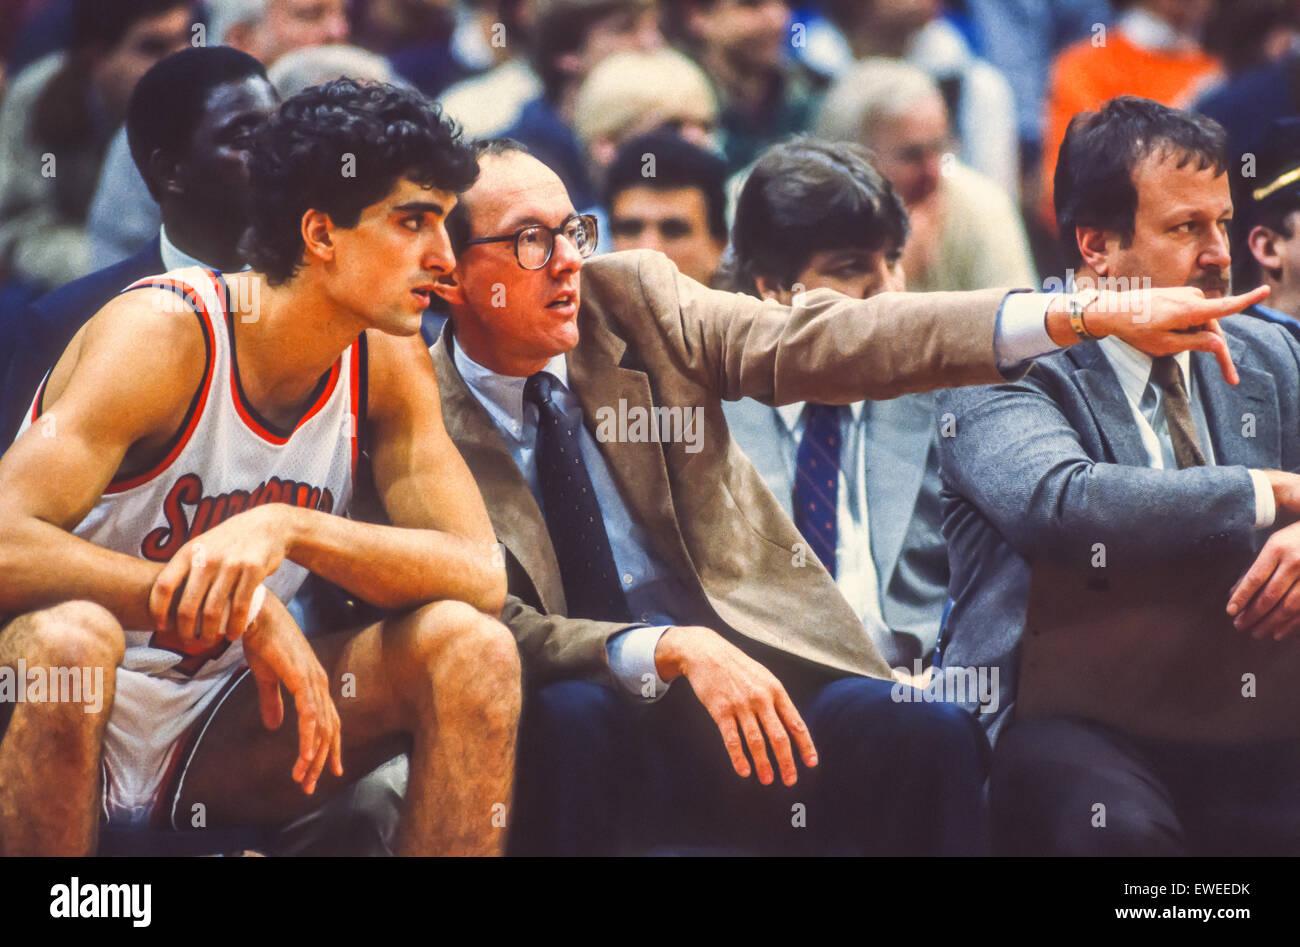 SYRACUSE, NEW YORK, USA - Coach Jim Boeheim talks to player Rony Seikaly during Syracuse Orangemen college NCAA - Stock Image